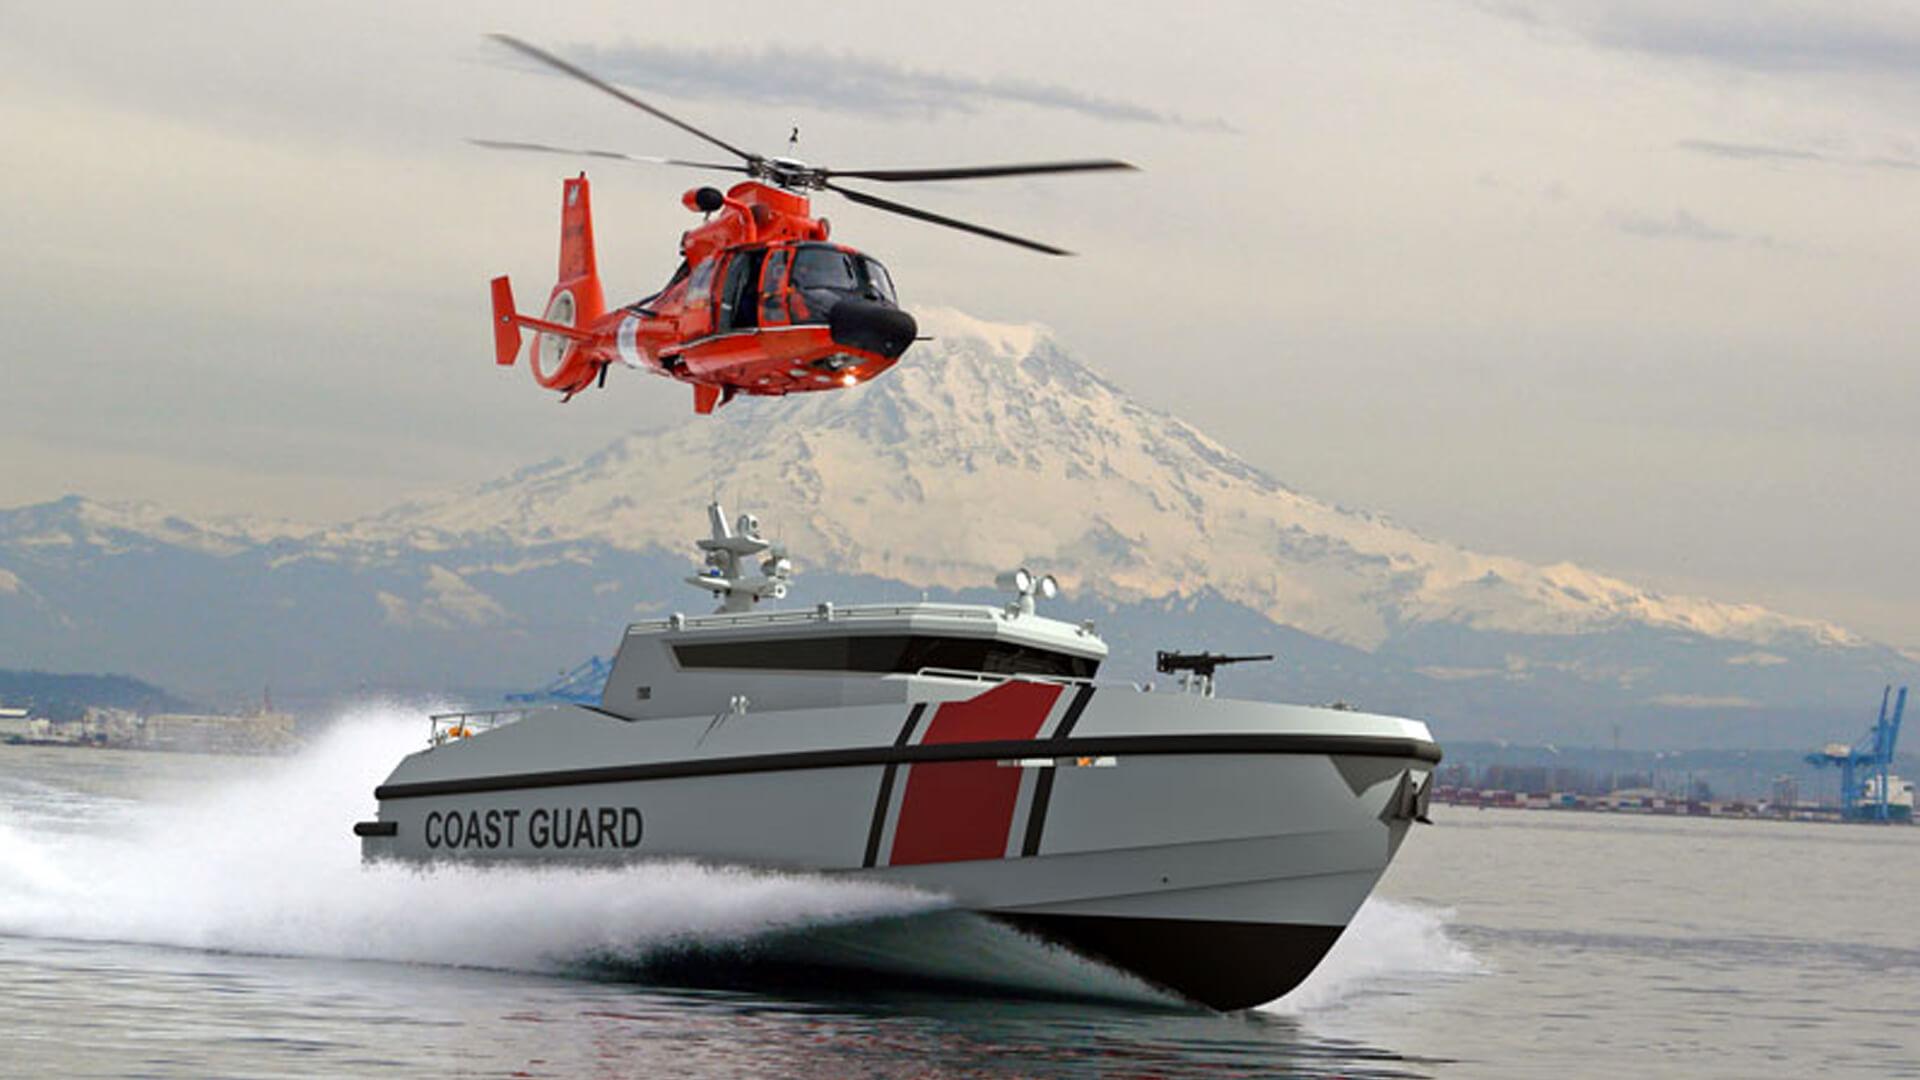 images/vessels/01-patrol-craft/04-series-hector/04-ares-55-hector/01.jpg